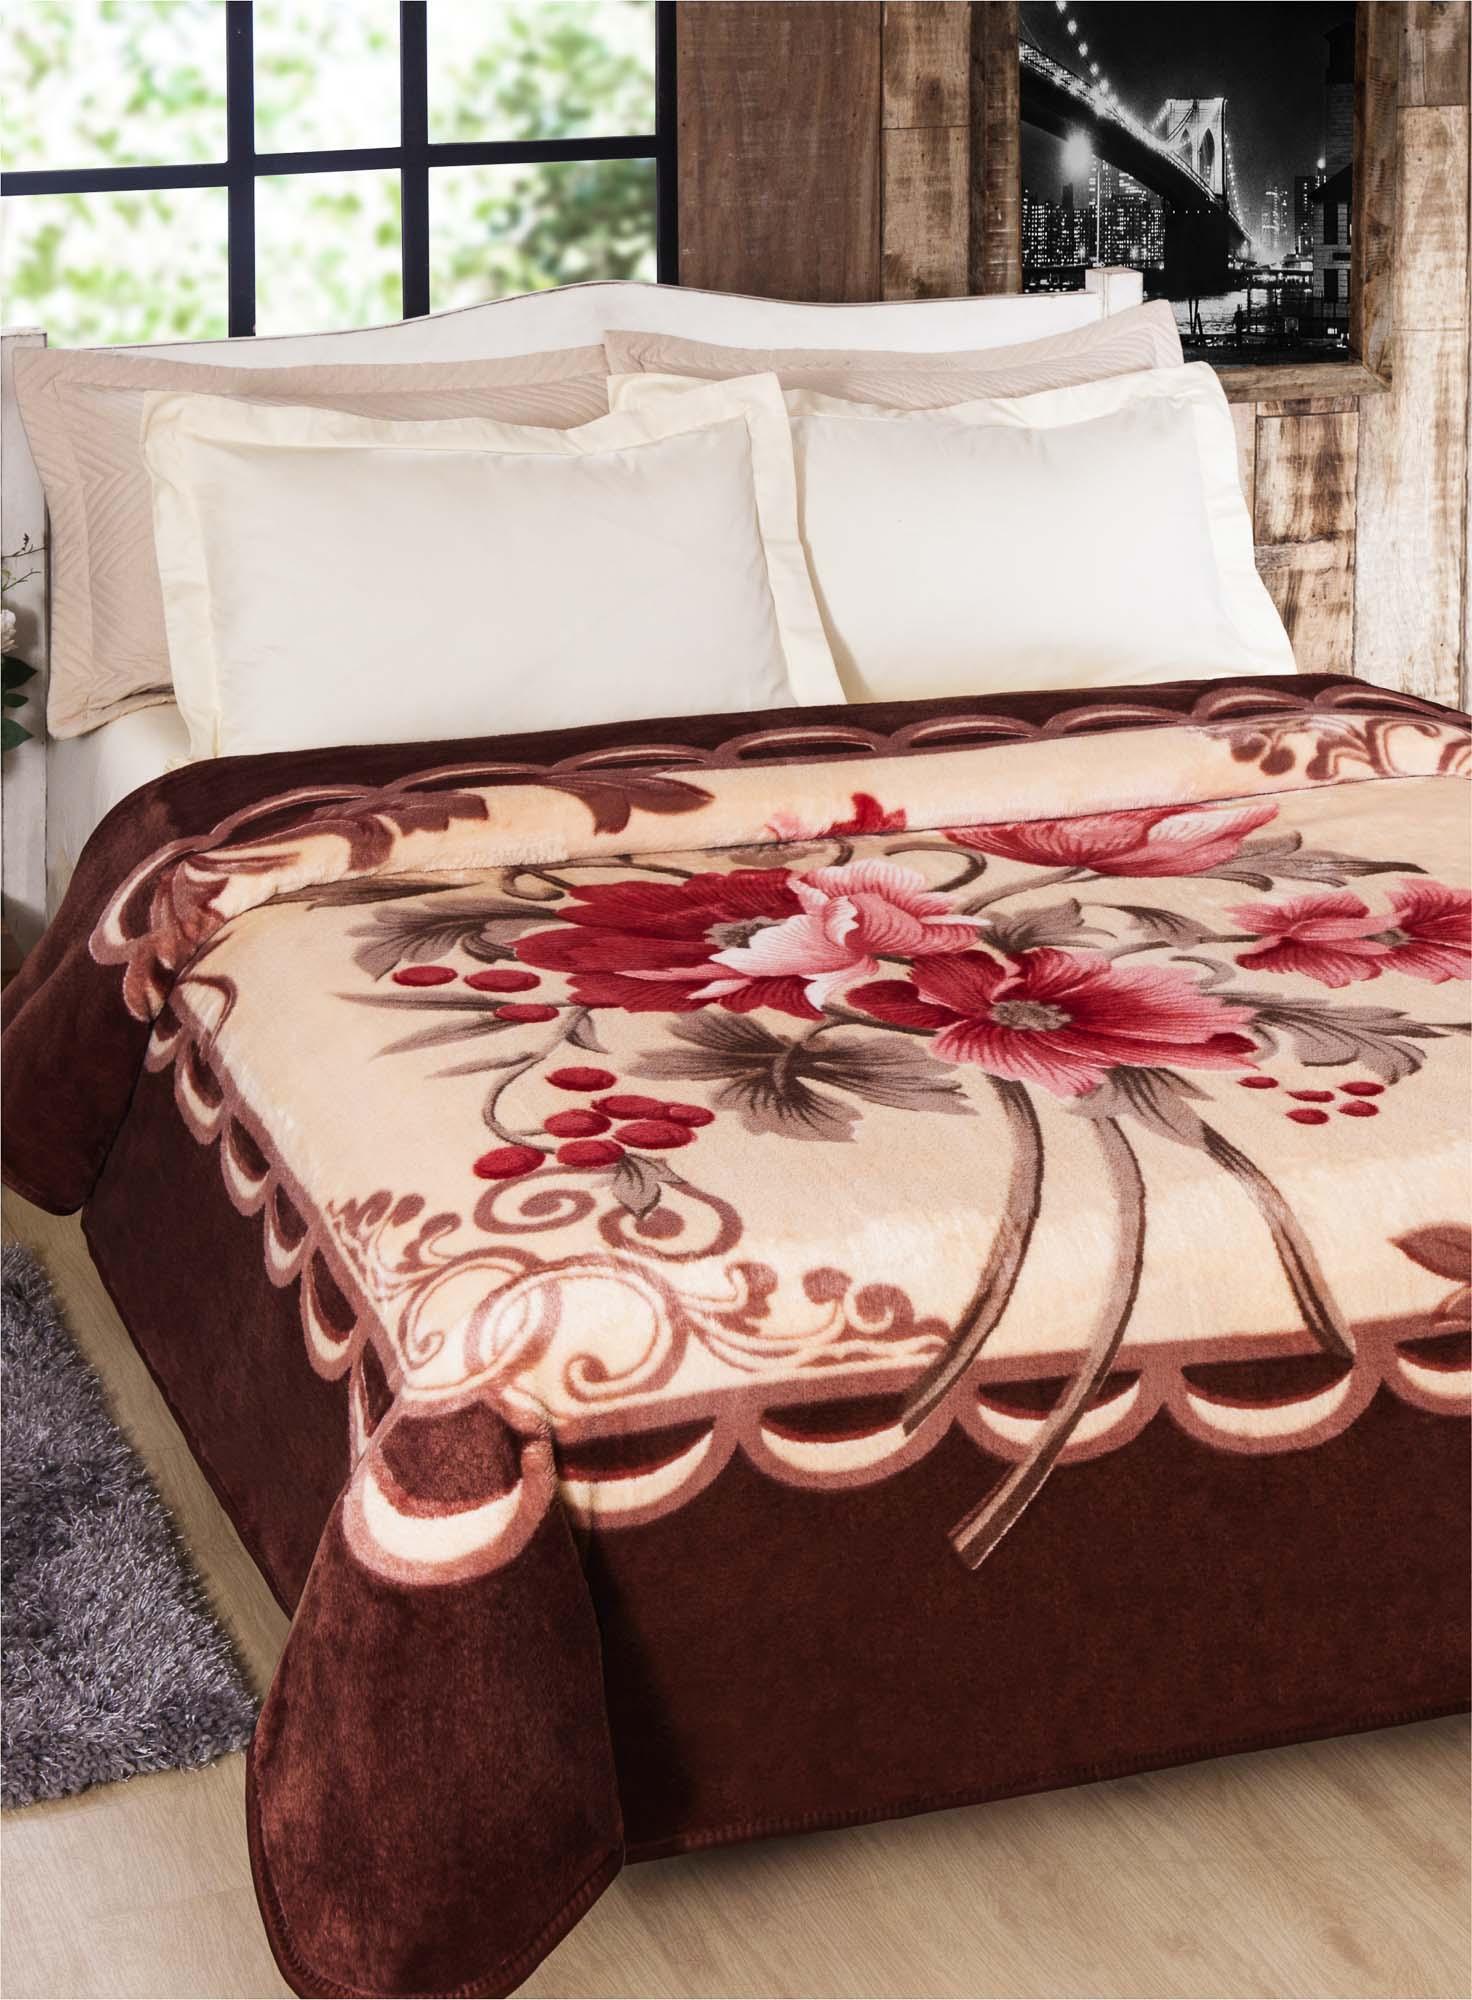 Cobertor Jolitex Casal Kyor Plus 1,80x2,20m New Fiore